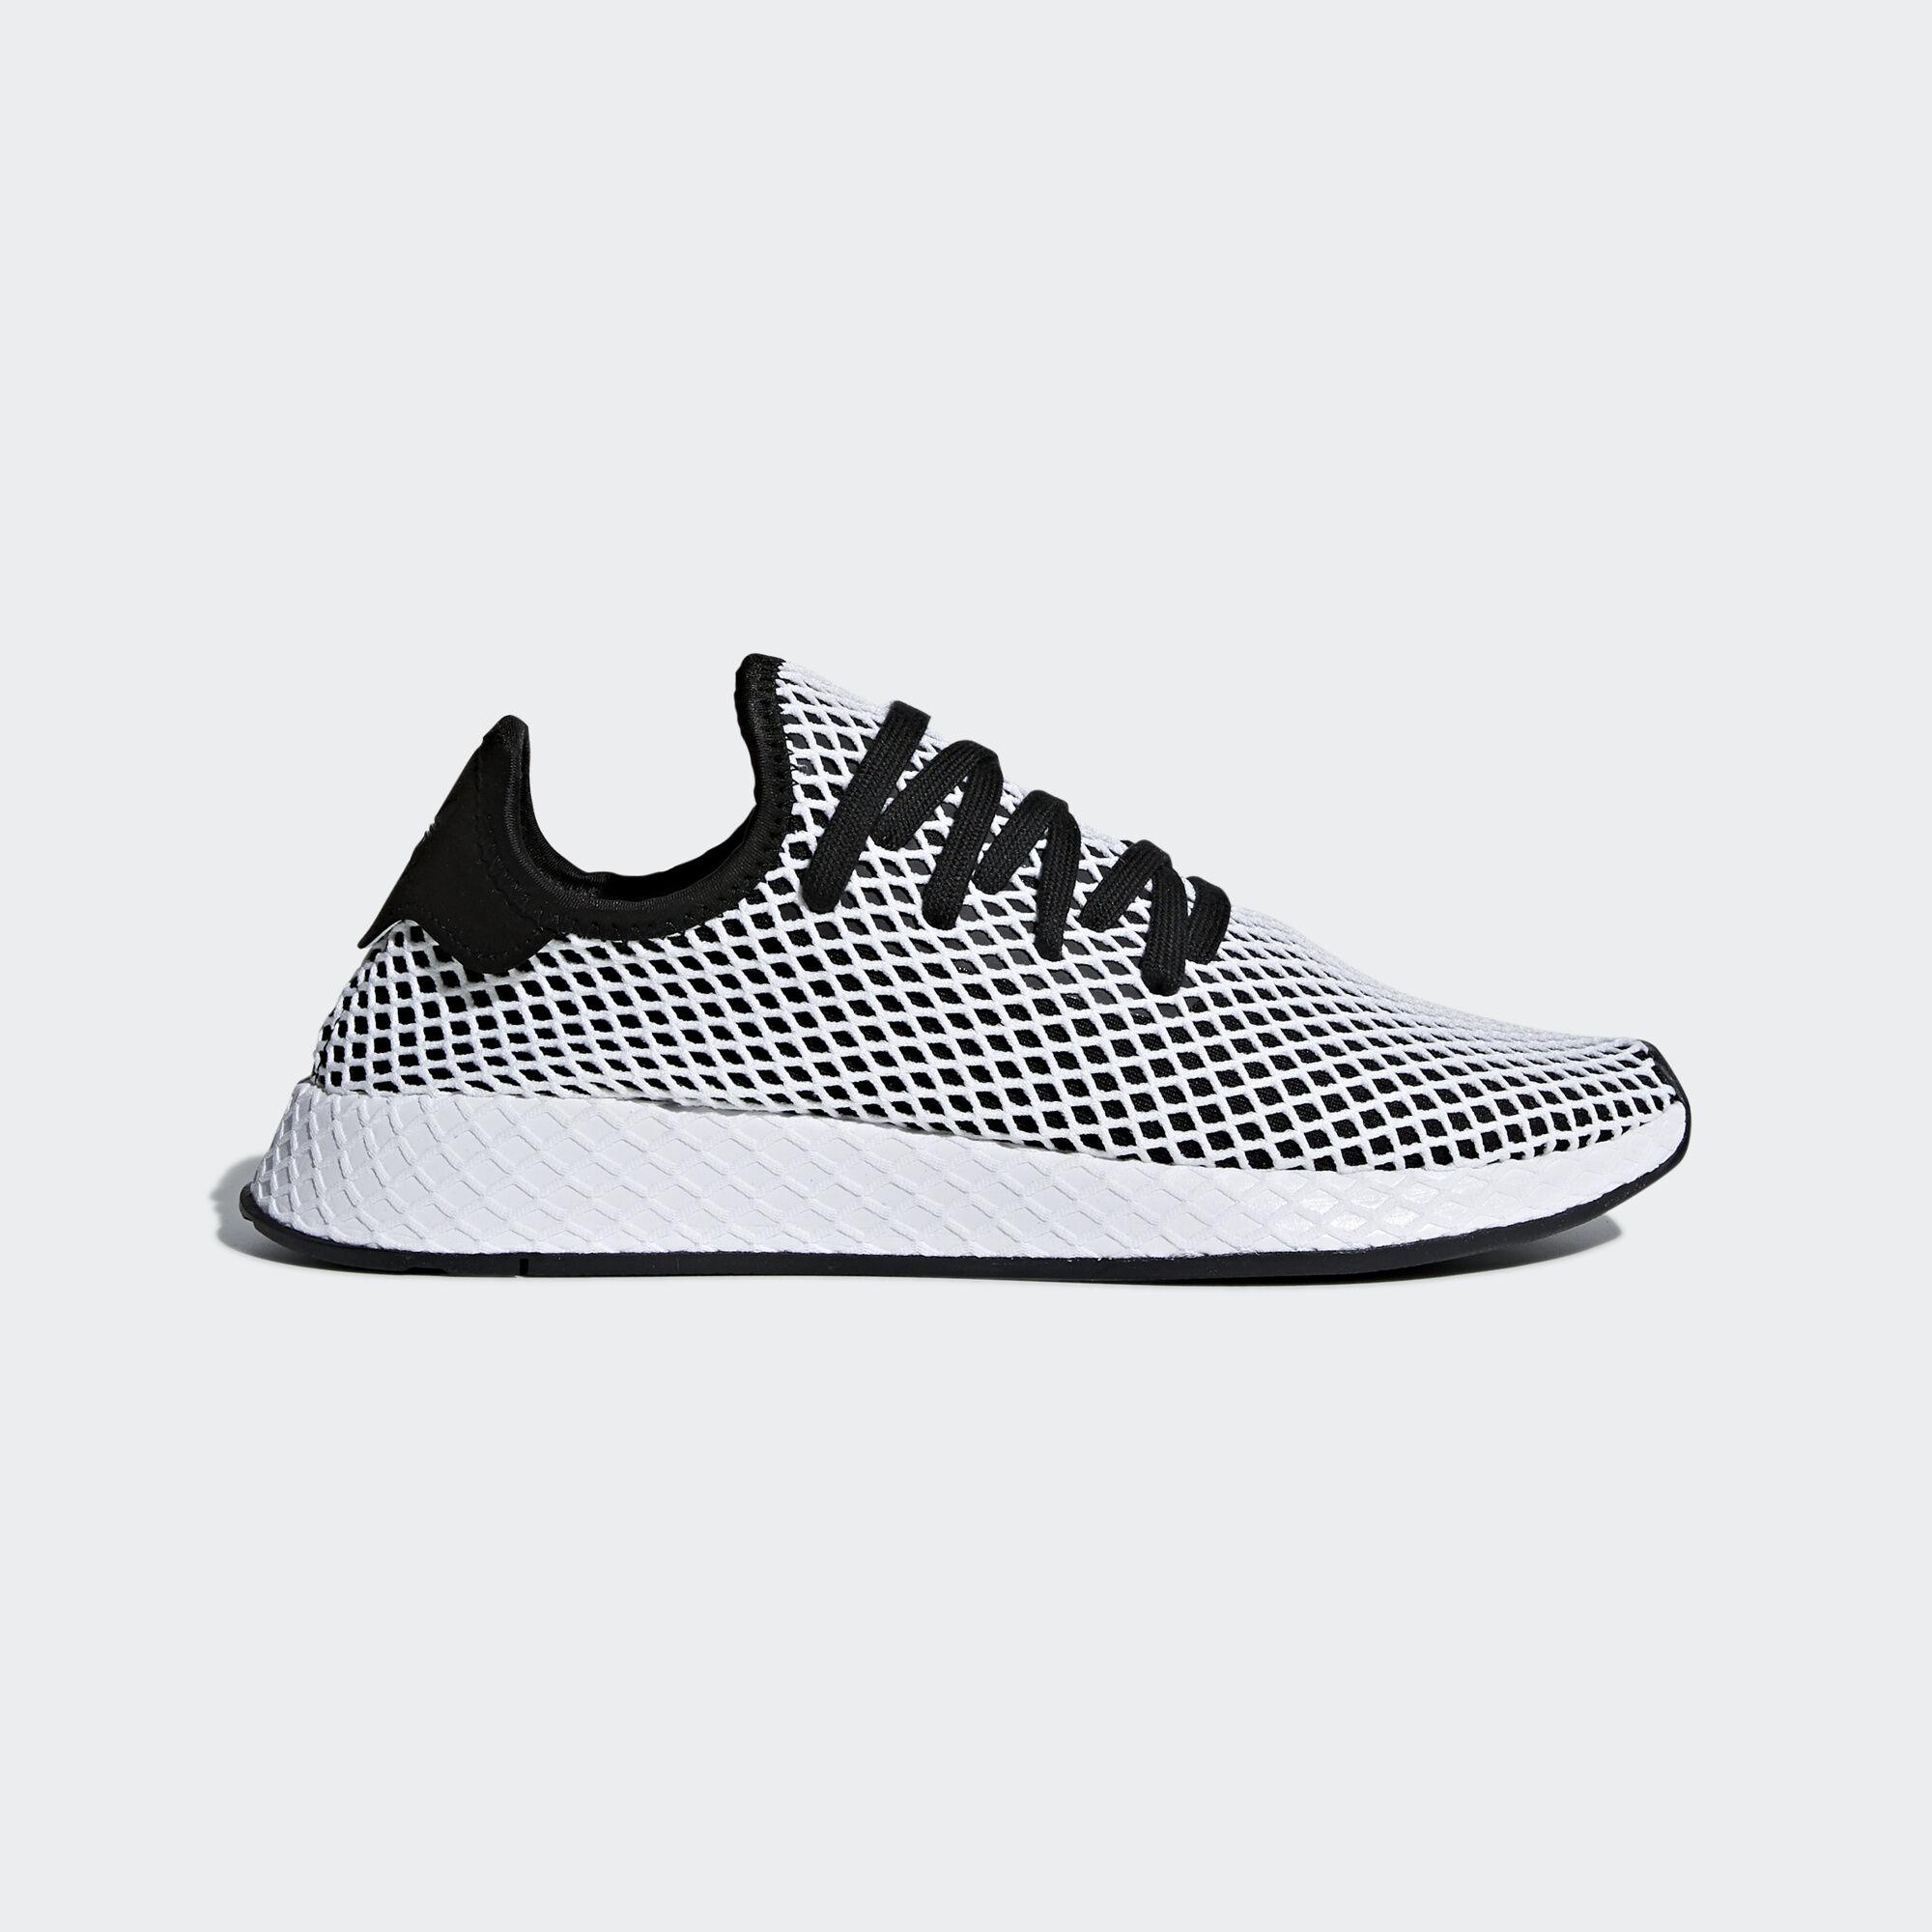 designer fashion 5cf7f 42cc2 ... adidas - Deerupt Runner Shoes Core BlackCore BlackFtwr White CQ2626 ...